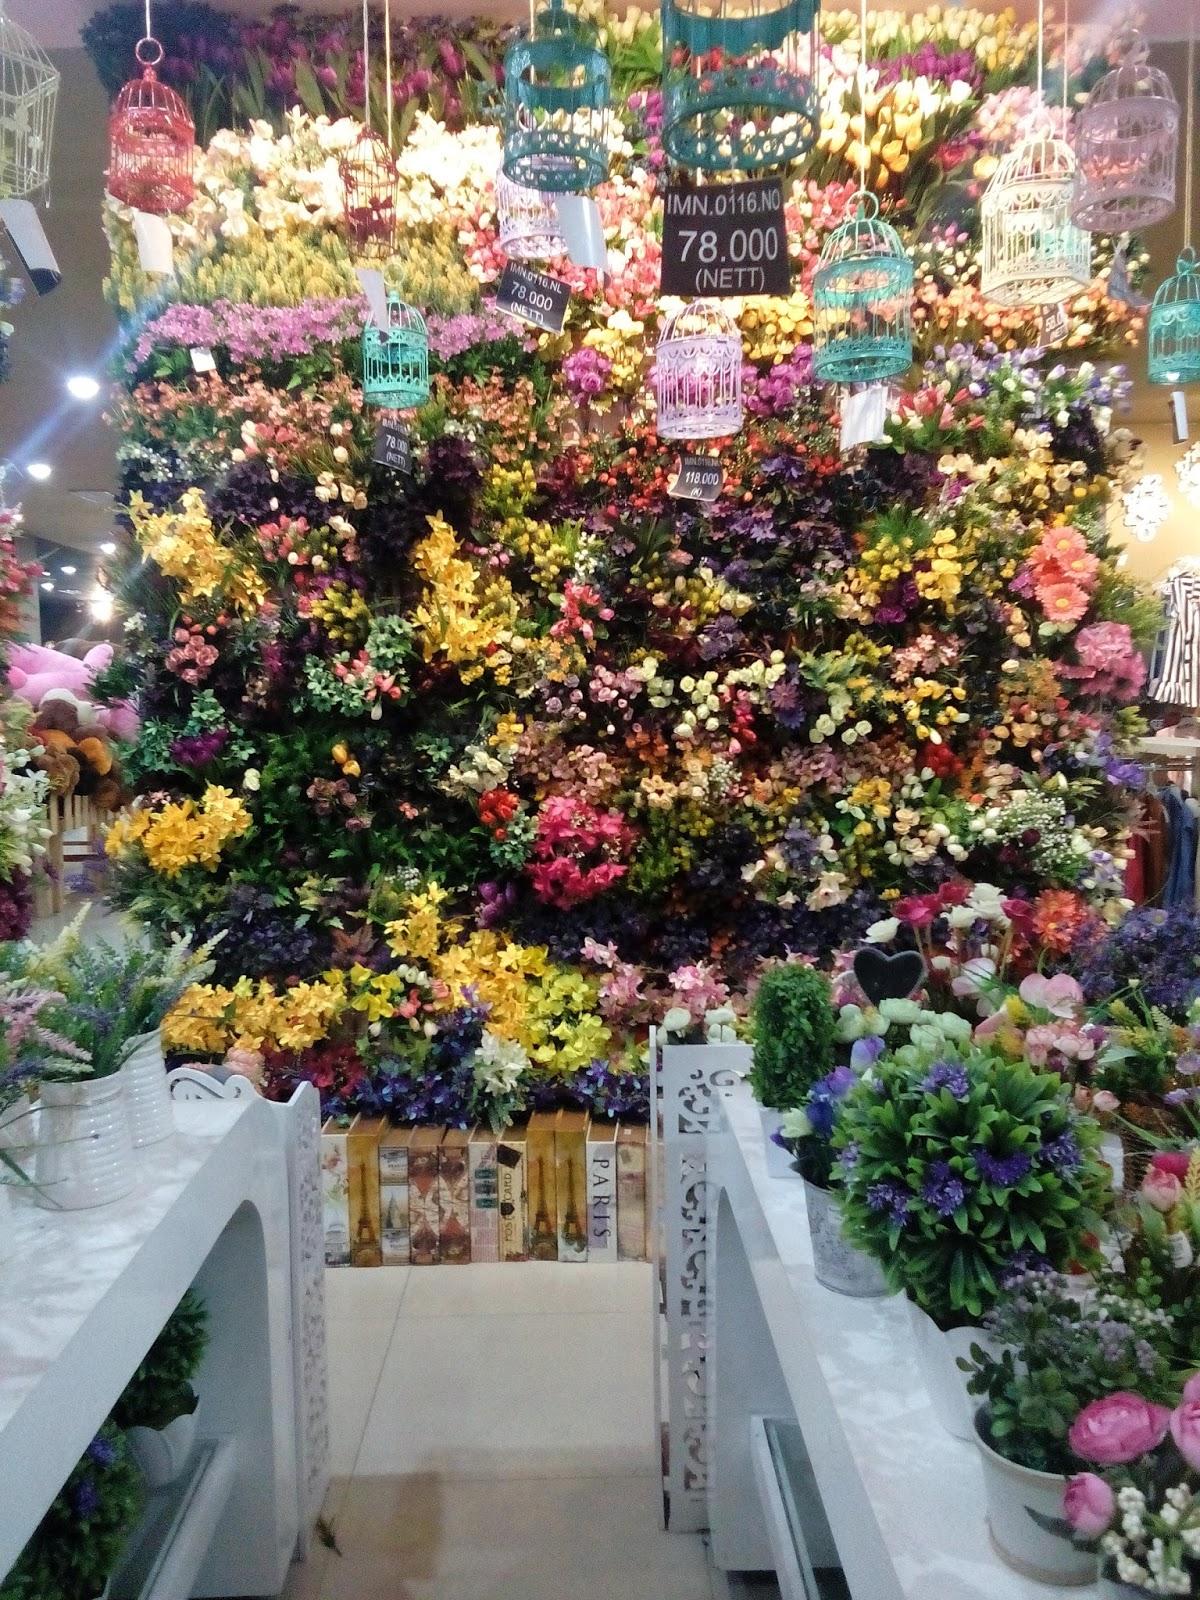 bunga sintetis Jolie Jogja Wirobrajan